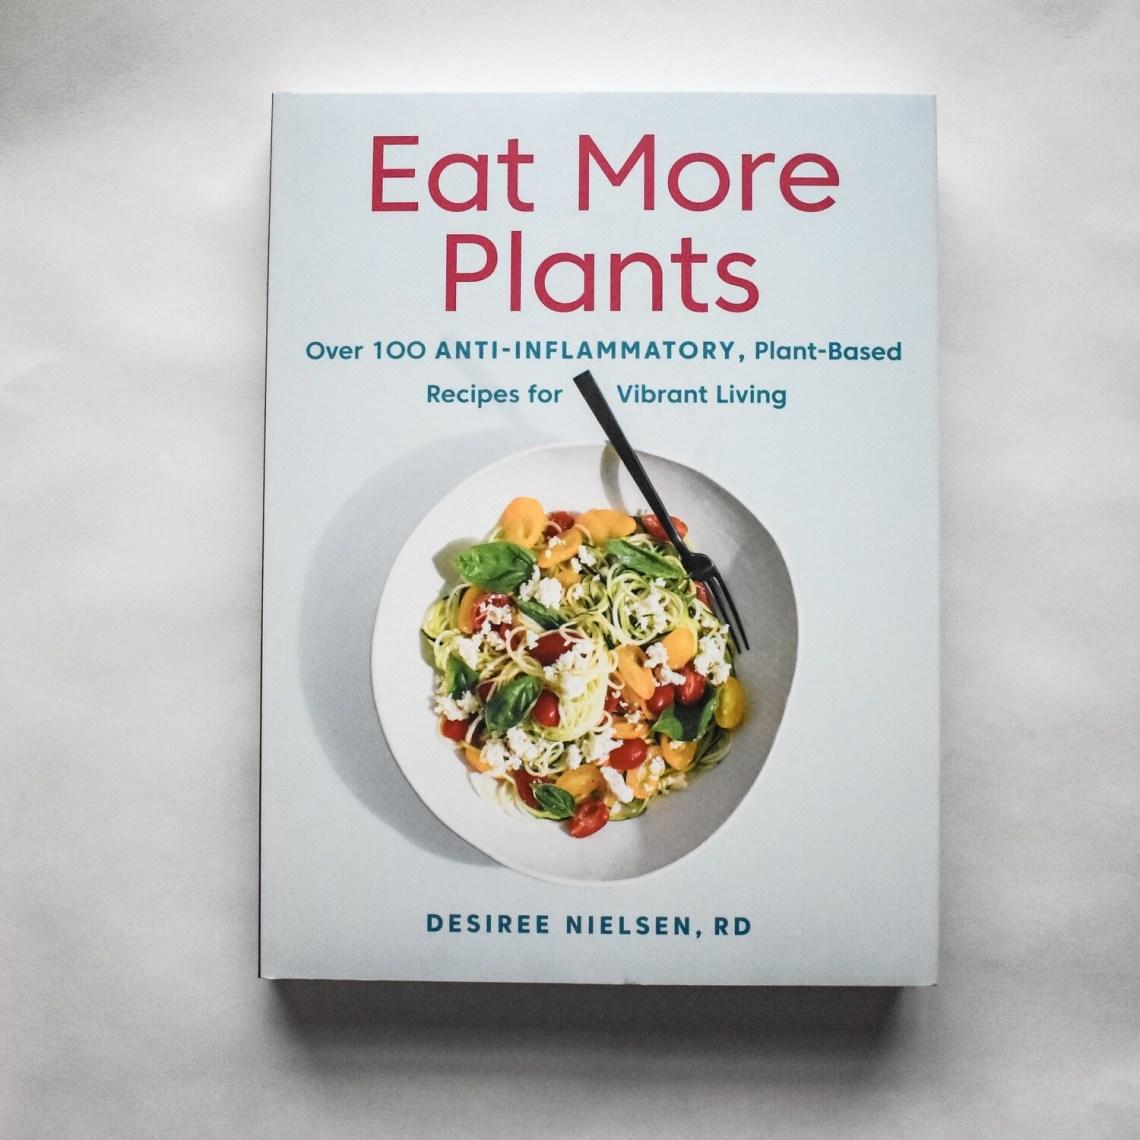 Eat More Plants - by Desiree Nielsen